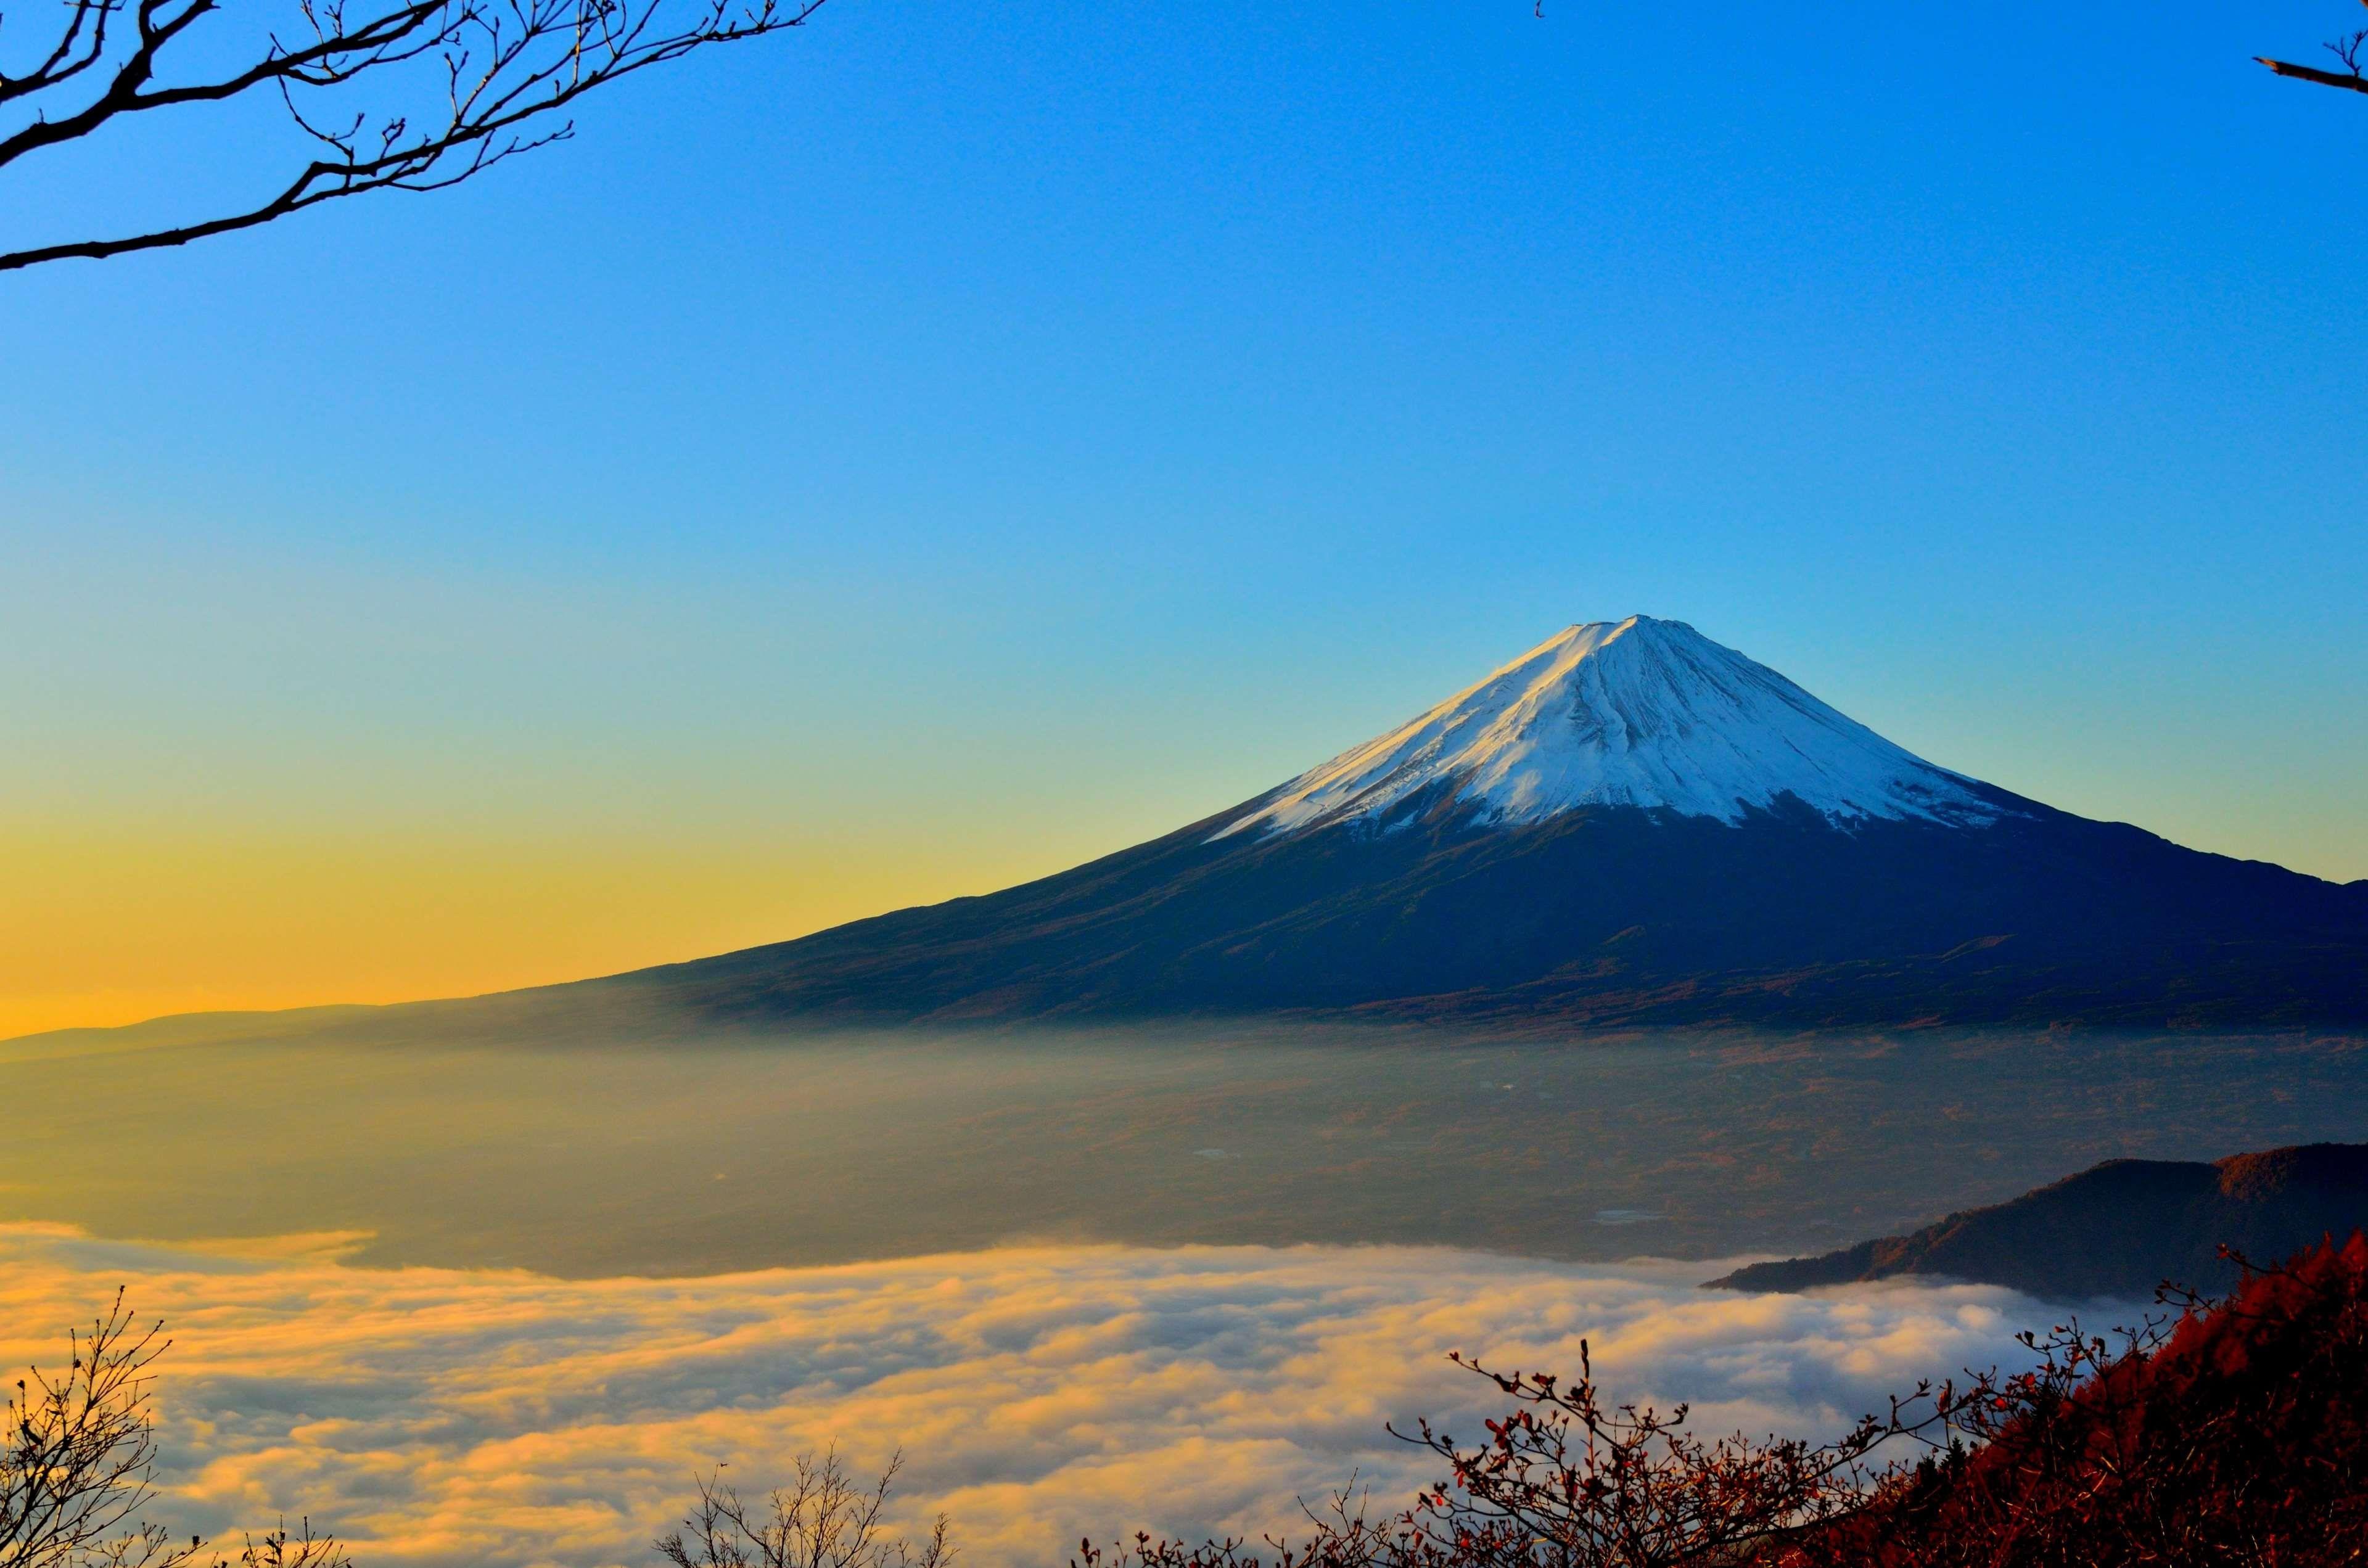 Clouds Dawn Dusk Fog Hd Wallpaper Japan Landscape